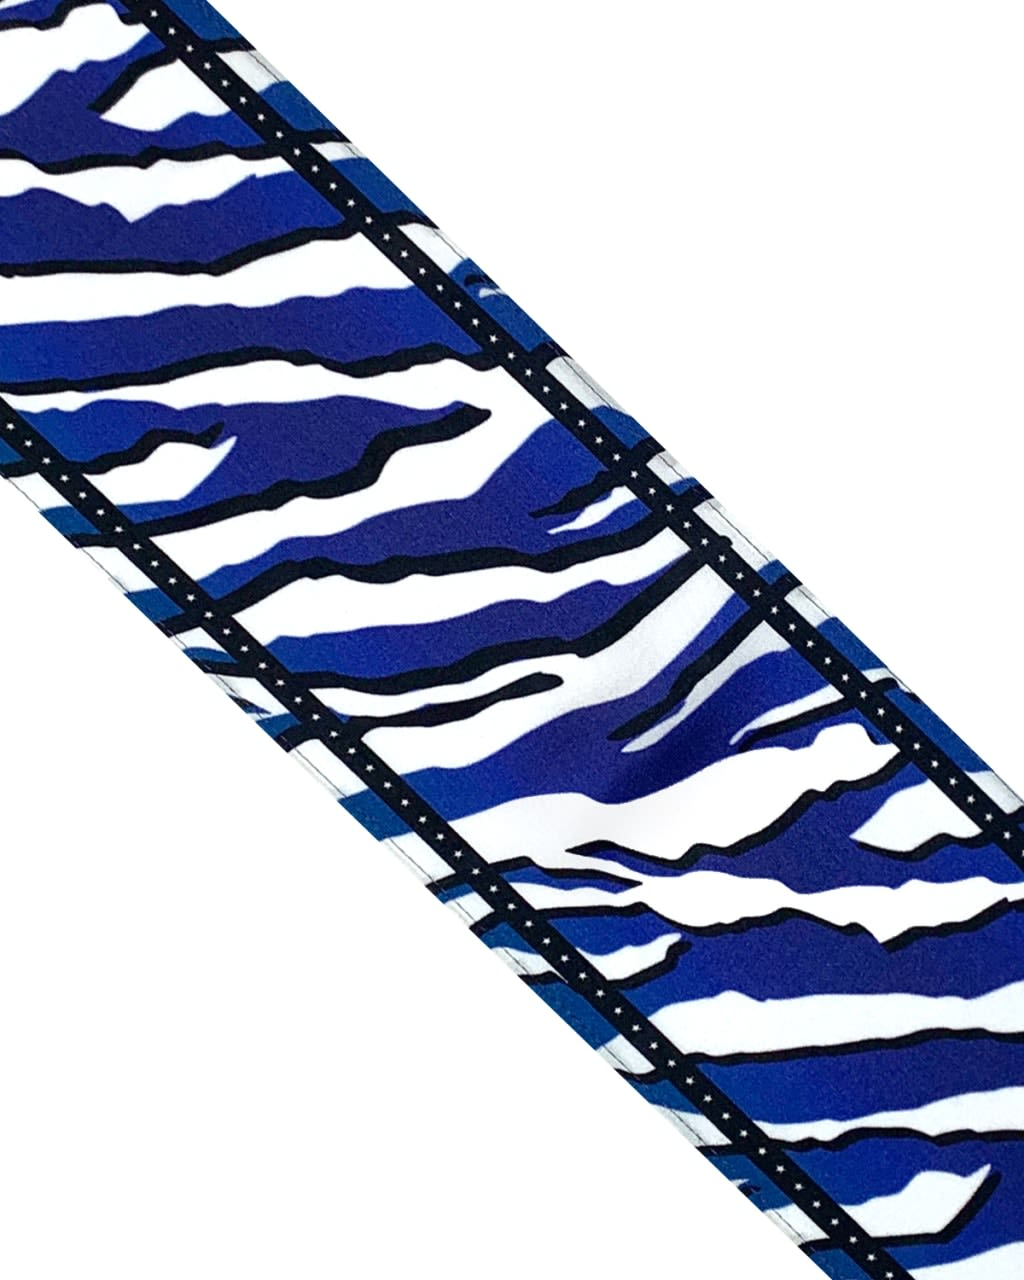 Wild Tiger Silk Neck Scarf Long Electric Blue